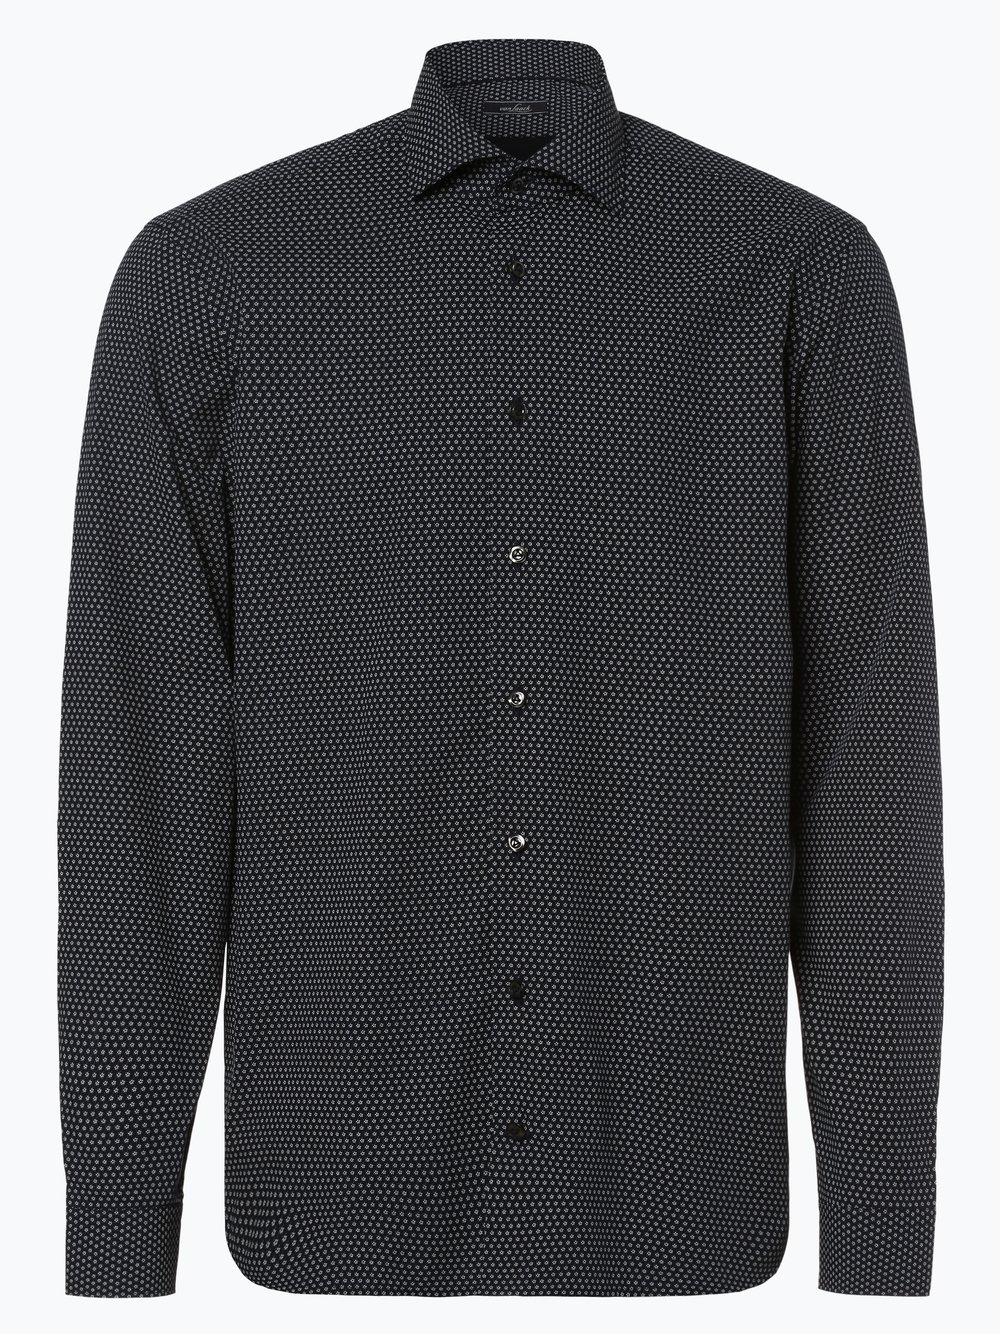 Van Laack – Koszula męska, niebieski Van Graaf 444148-0001-00450